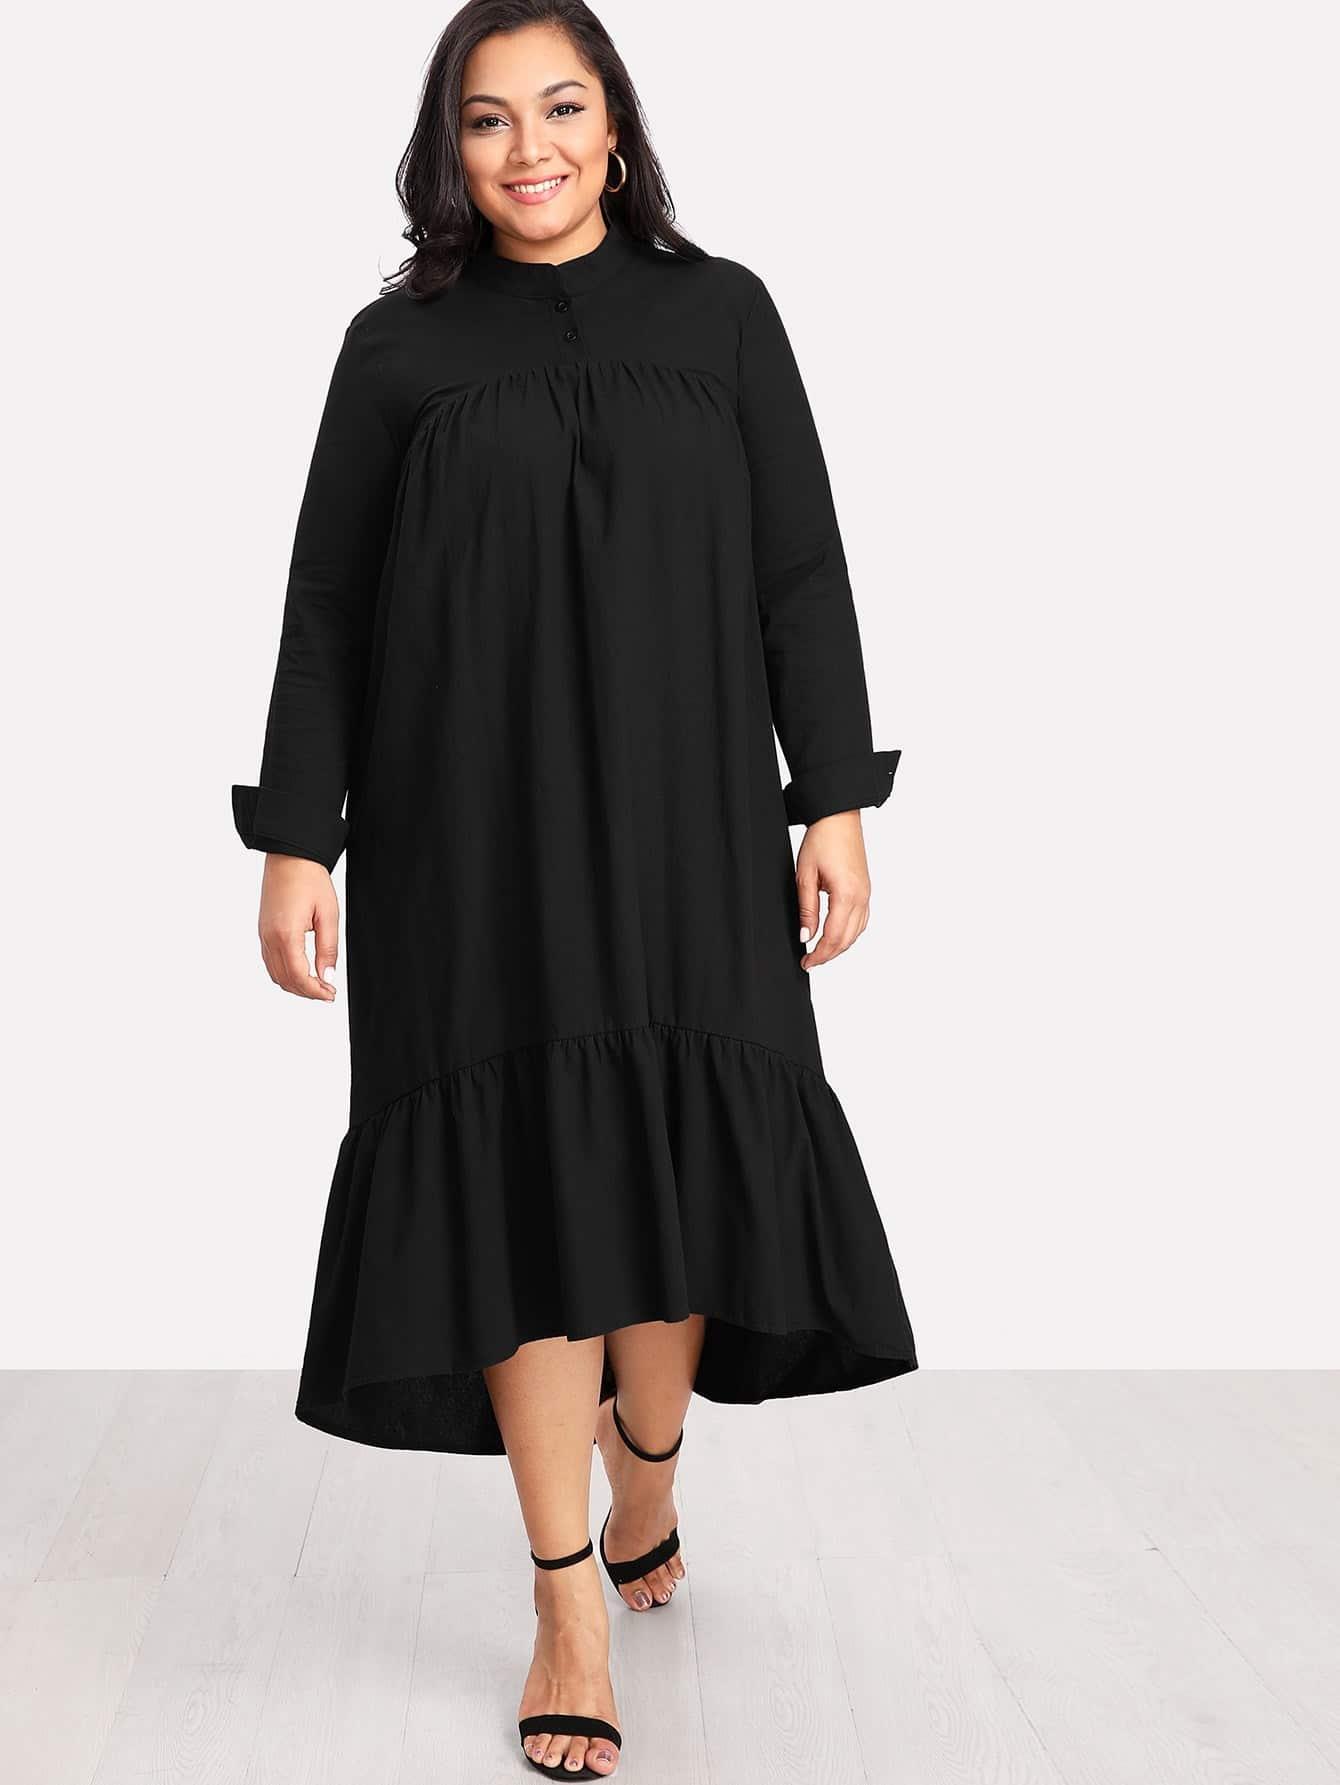 Ruffle Hem Solid Dress